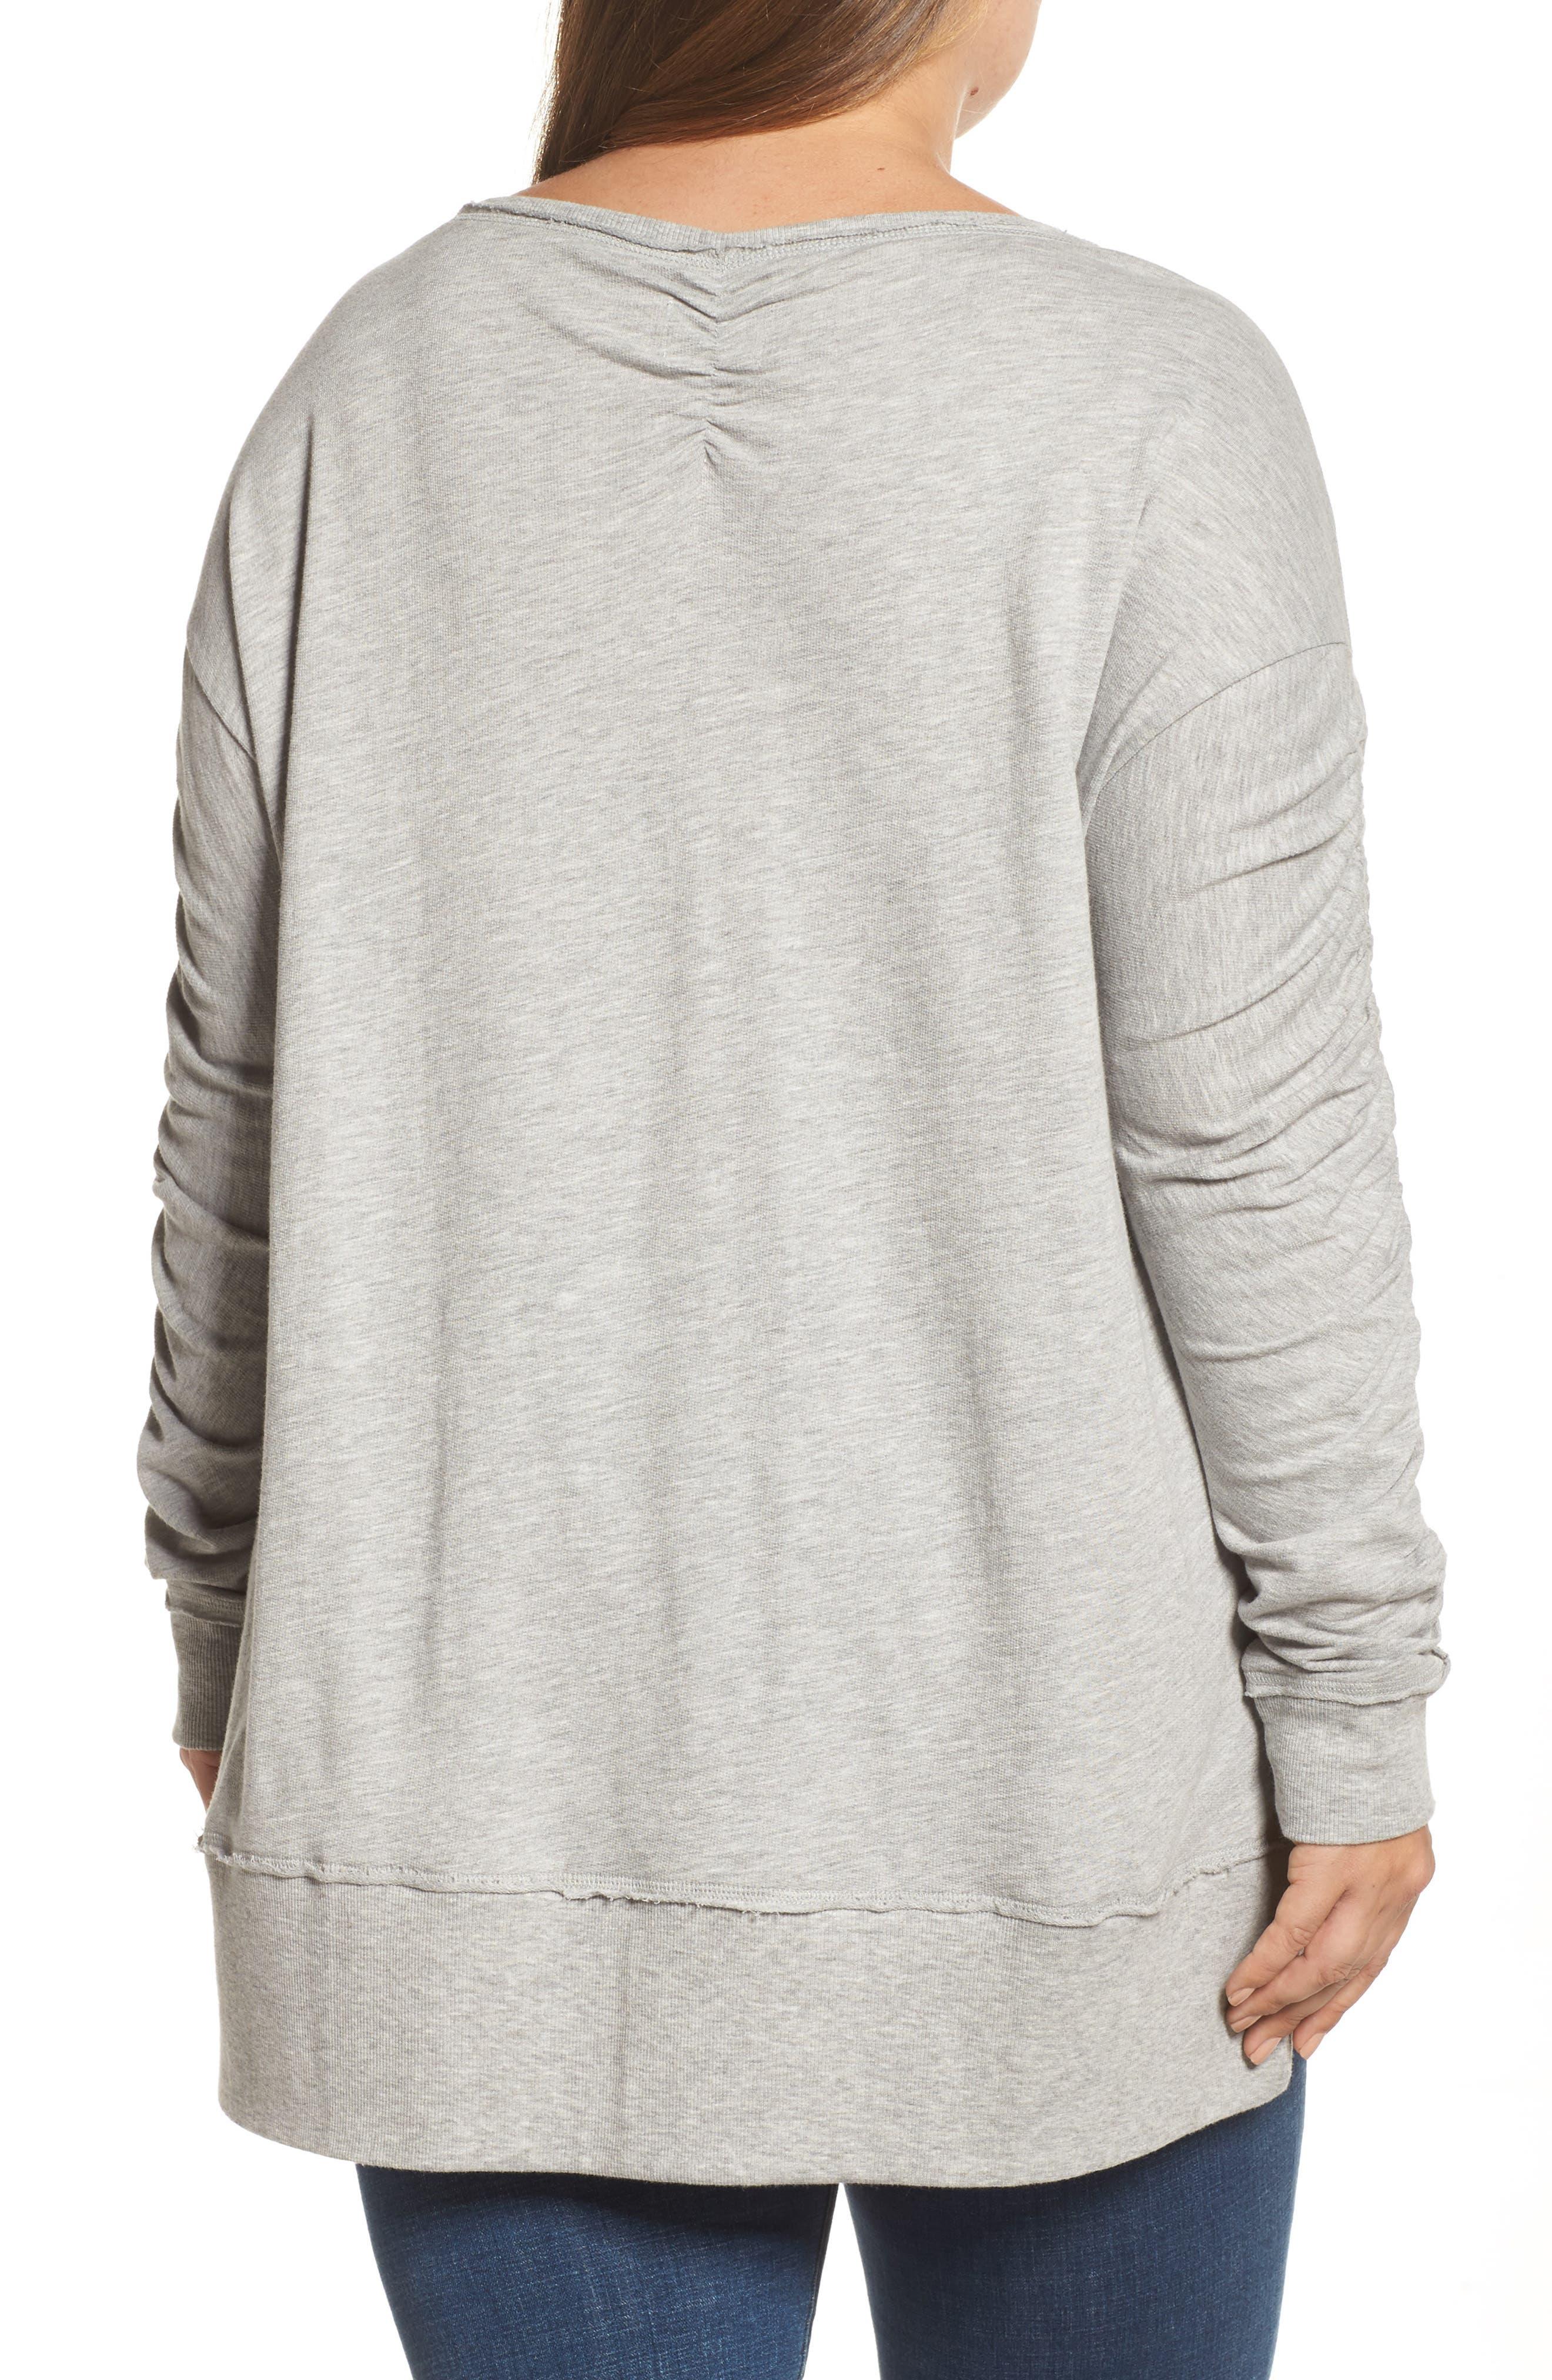 Scrunch Sleeve Sweatshirt,                             Alternate thumbnail 2, color,                             030